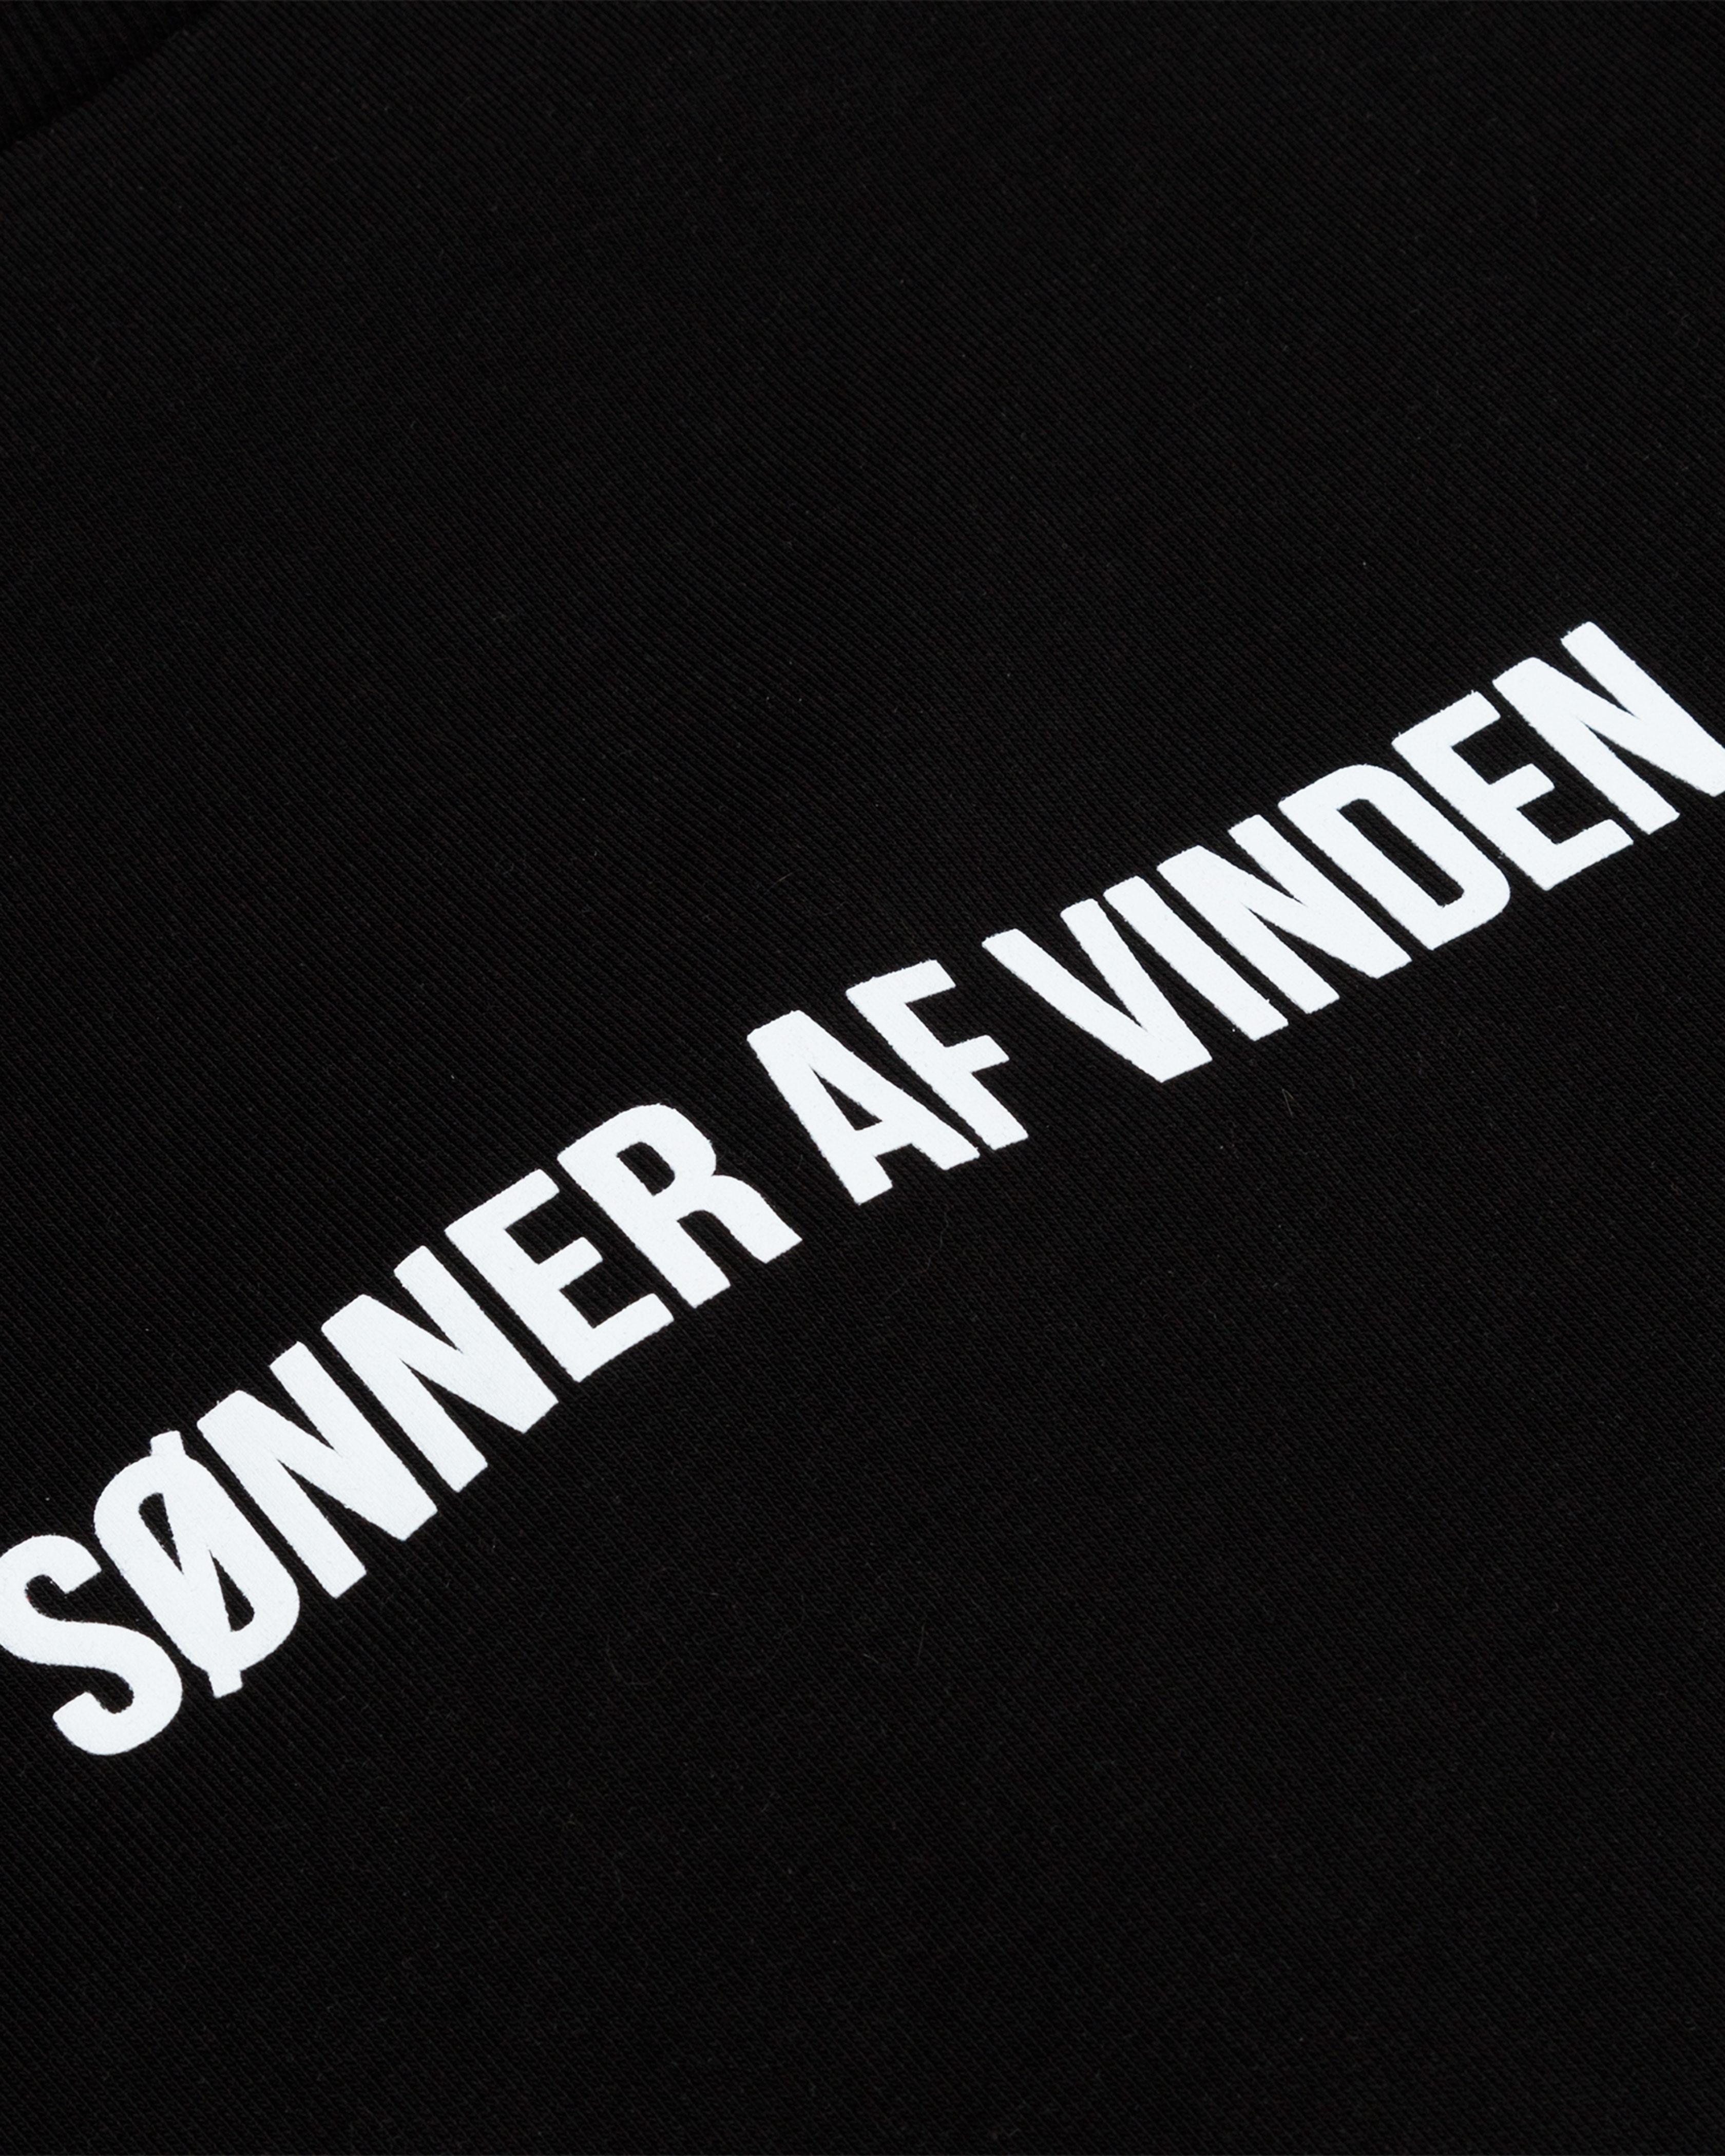 Свитшот Sønner Af-Vinden Muspellsheimr Black Sweatshirt